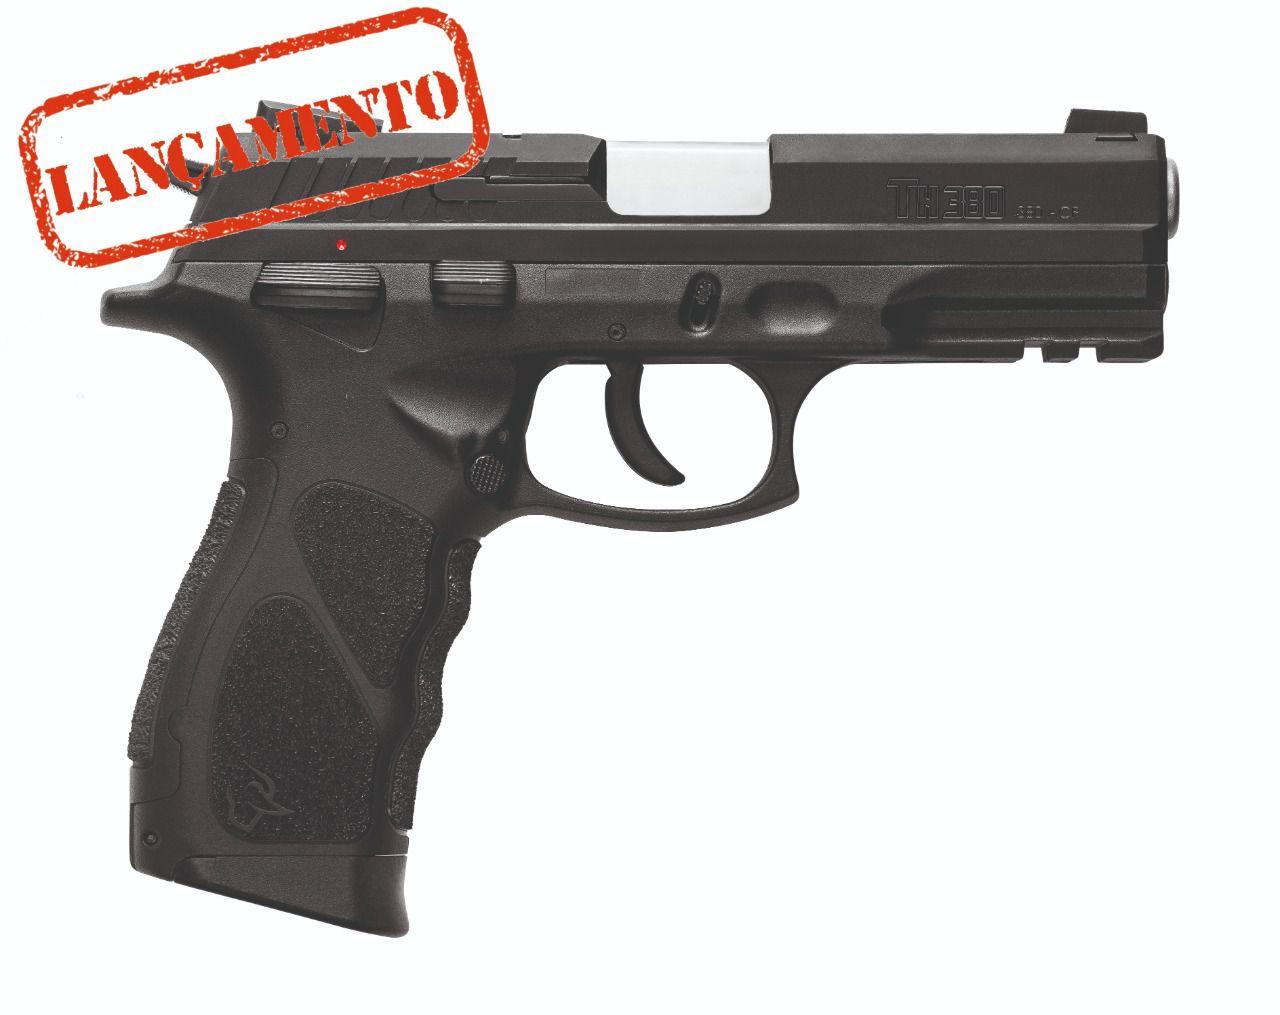 Pistola Taurus Hammer TH380 Cal. .380ACP Oxidado - 18 Tiros